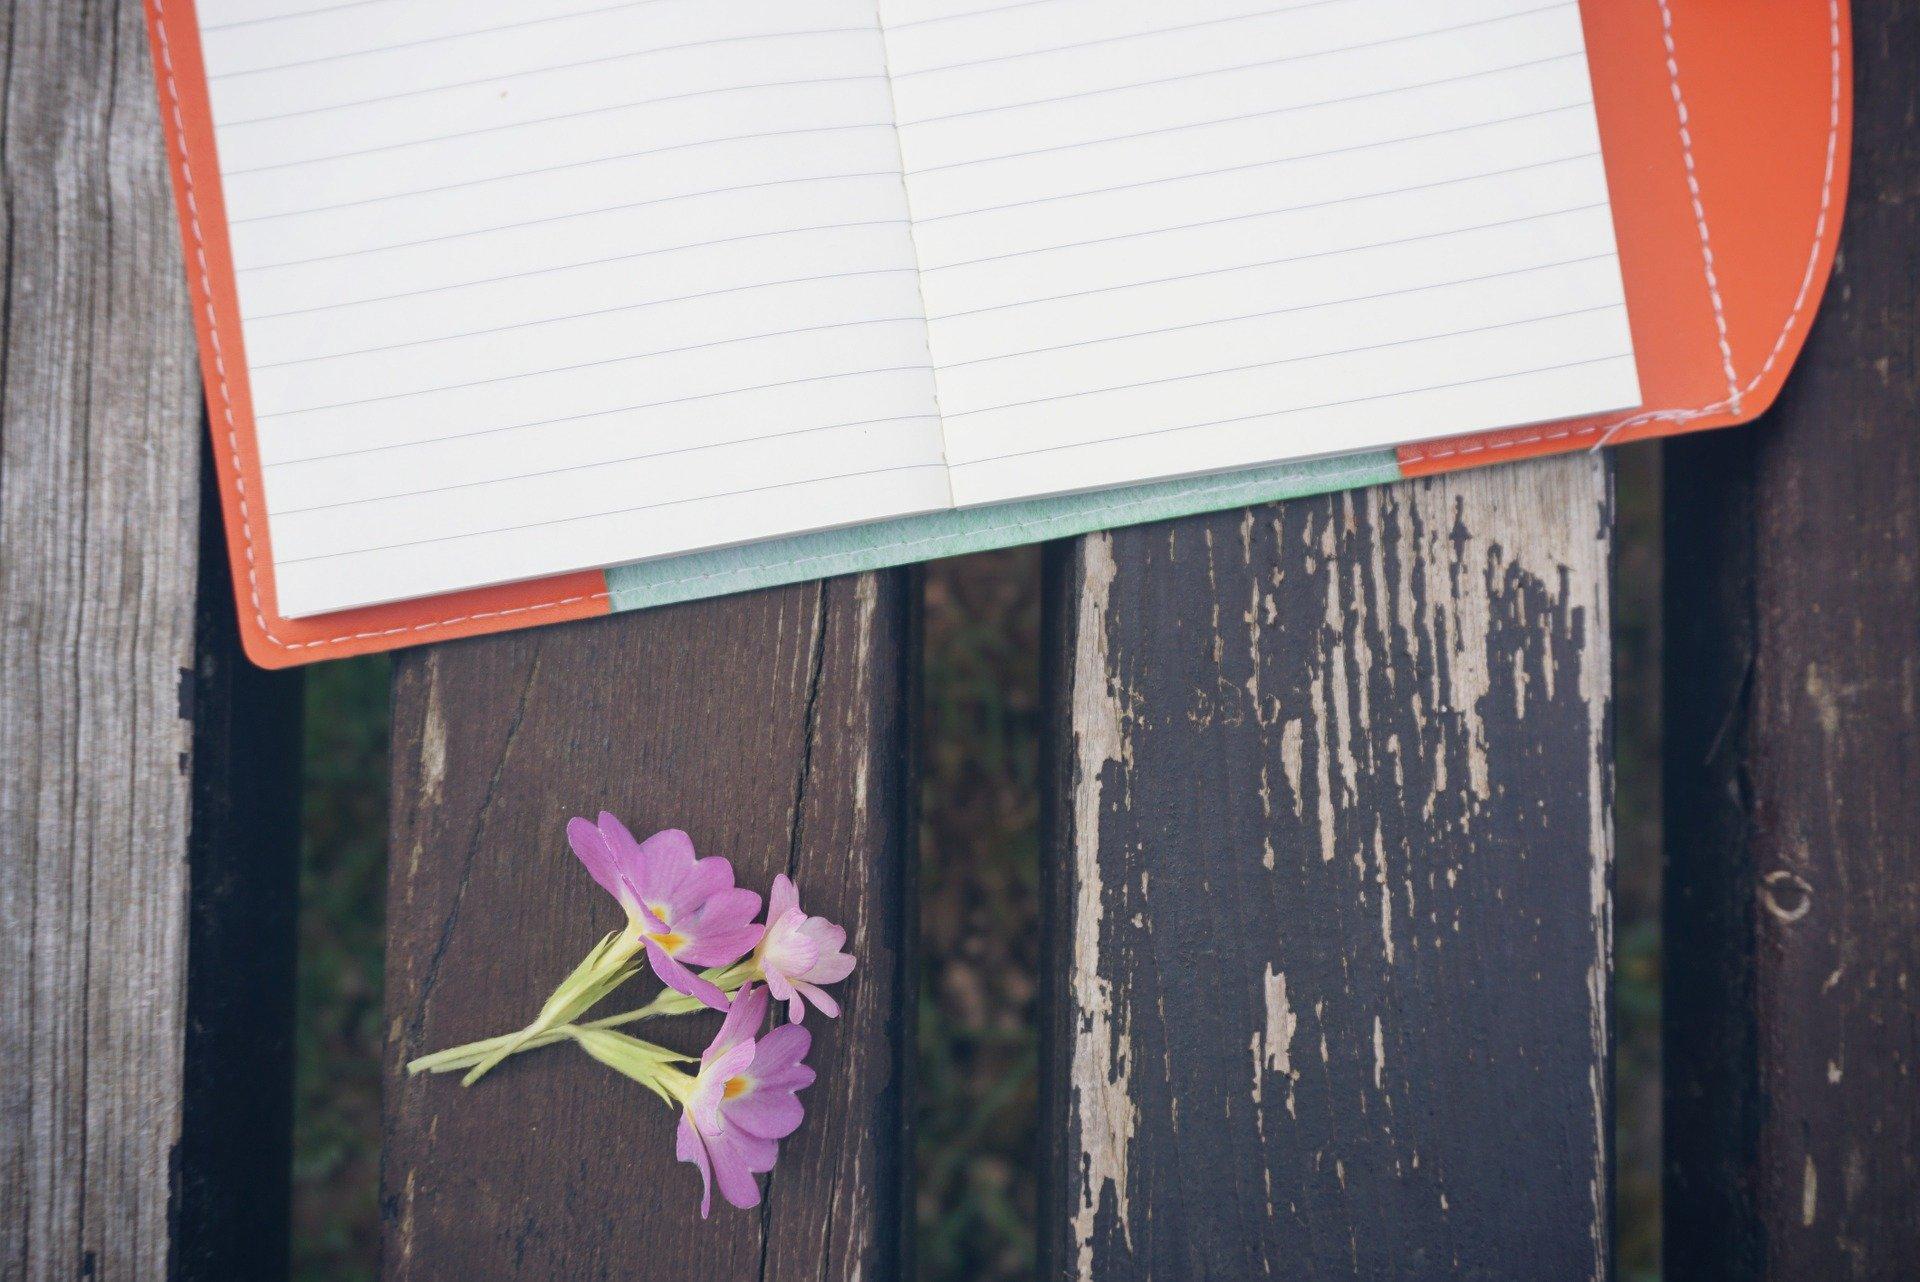 bench-student-nptebook